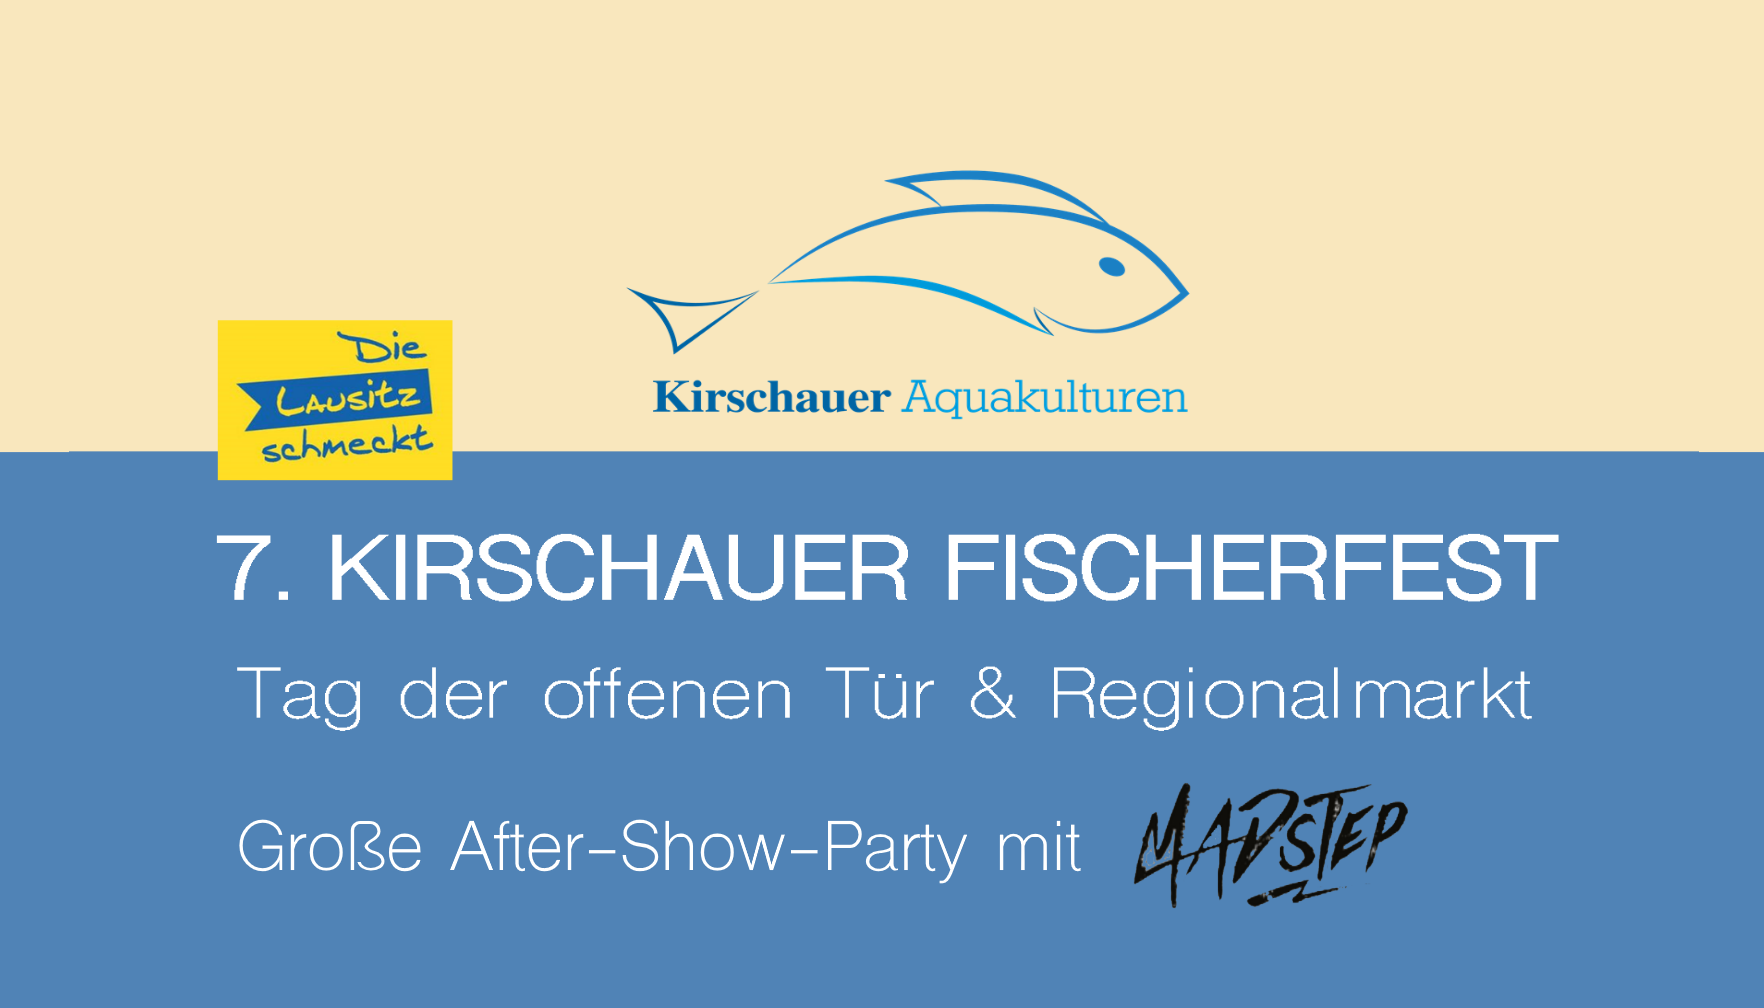 7. Kirschauer Fischerfest